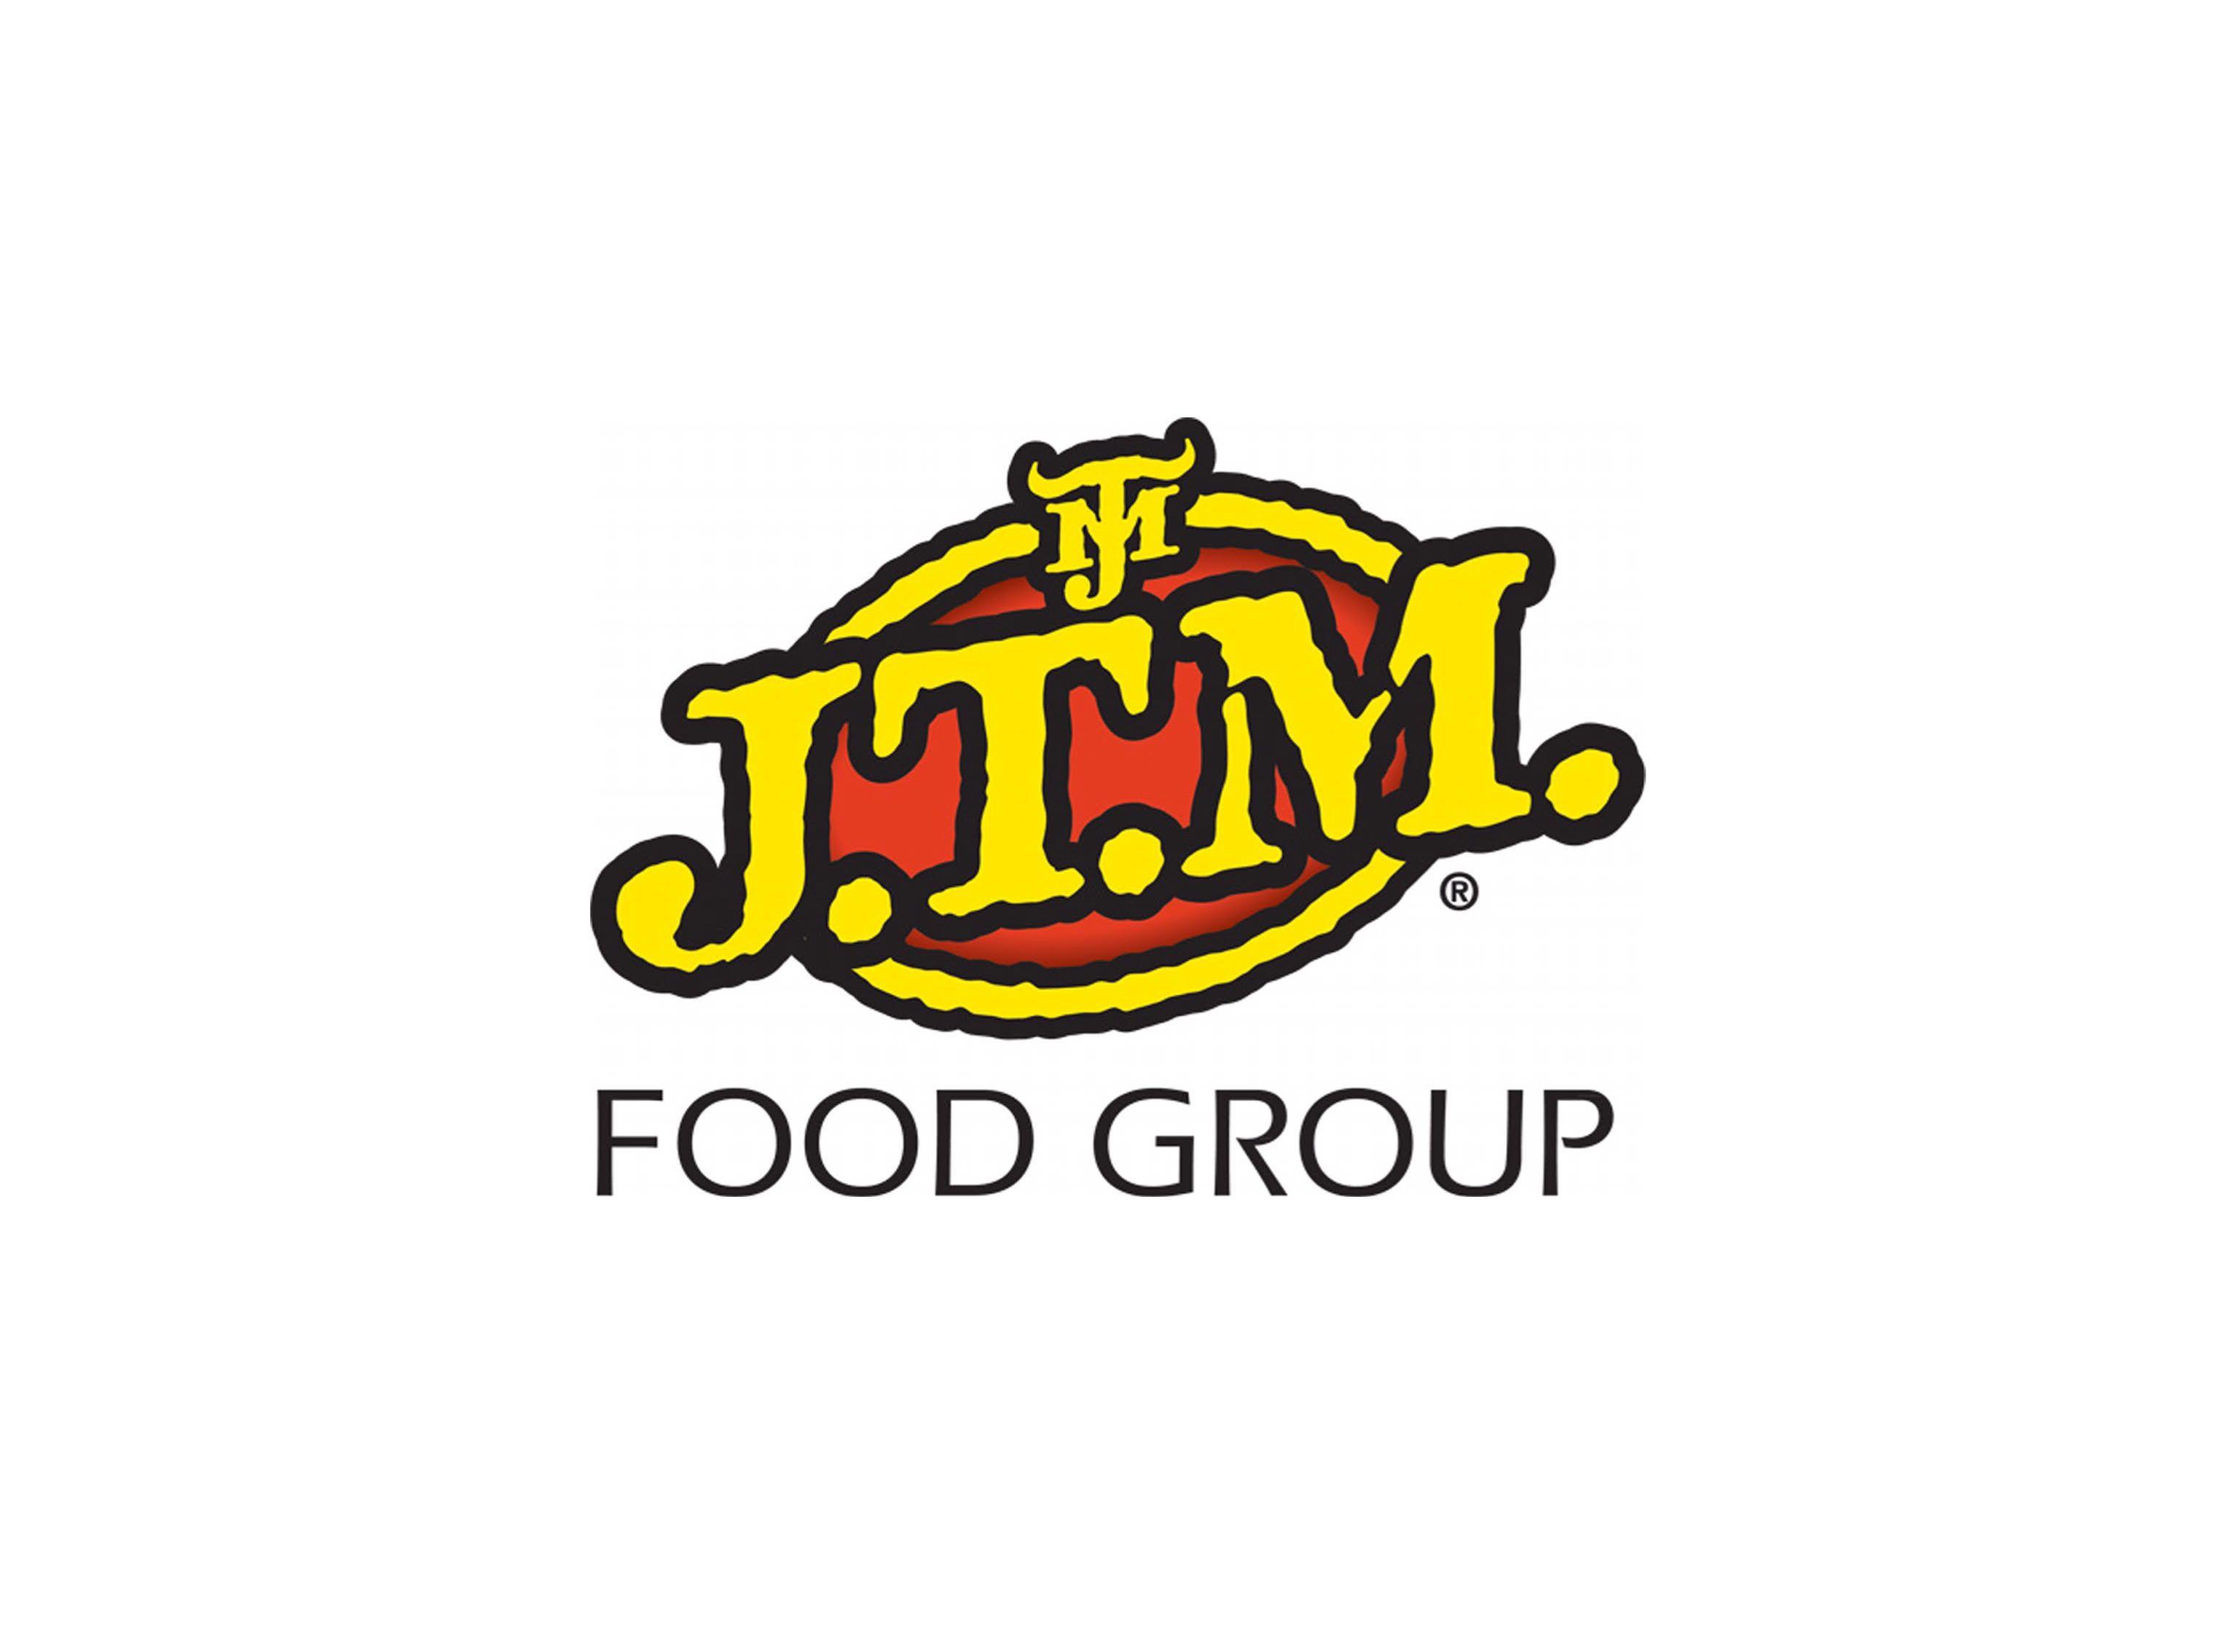 JTM Food Group Earns GFSI Certification Group meals